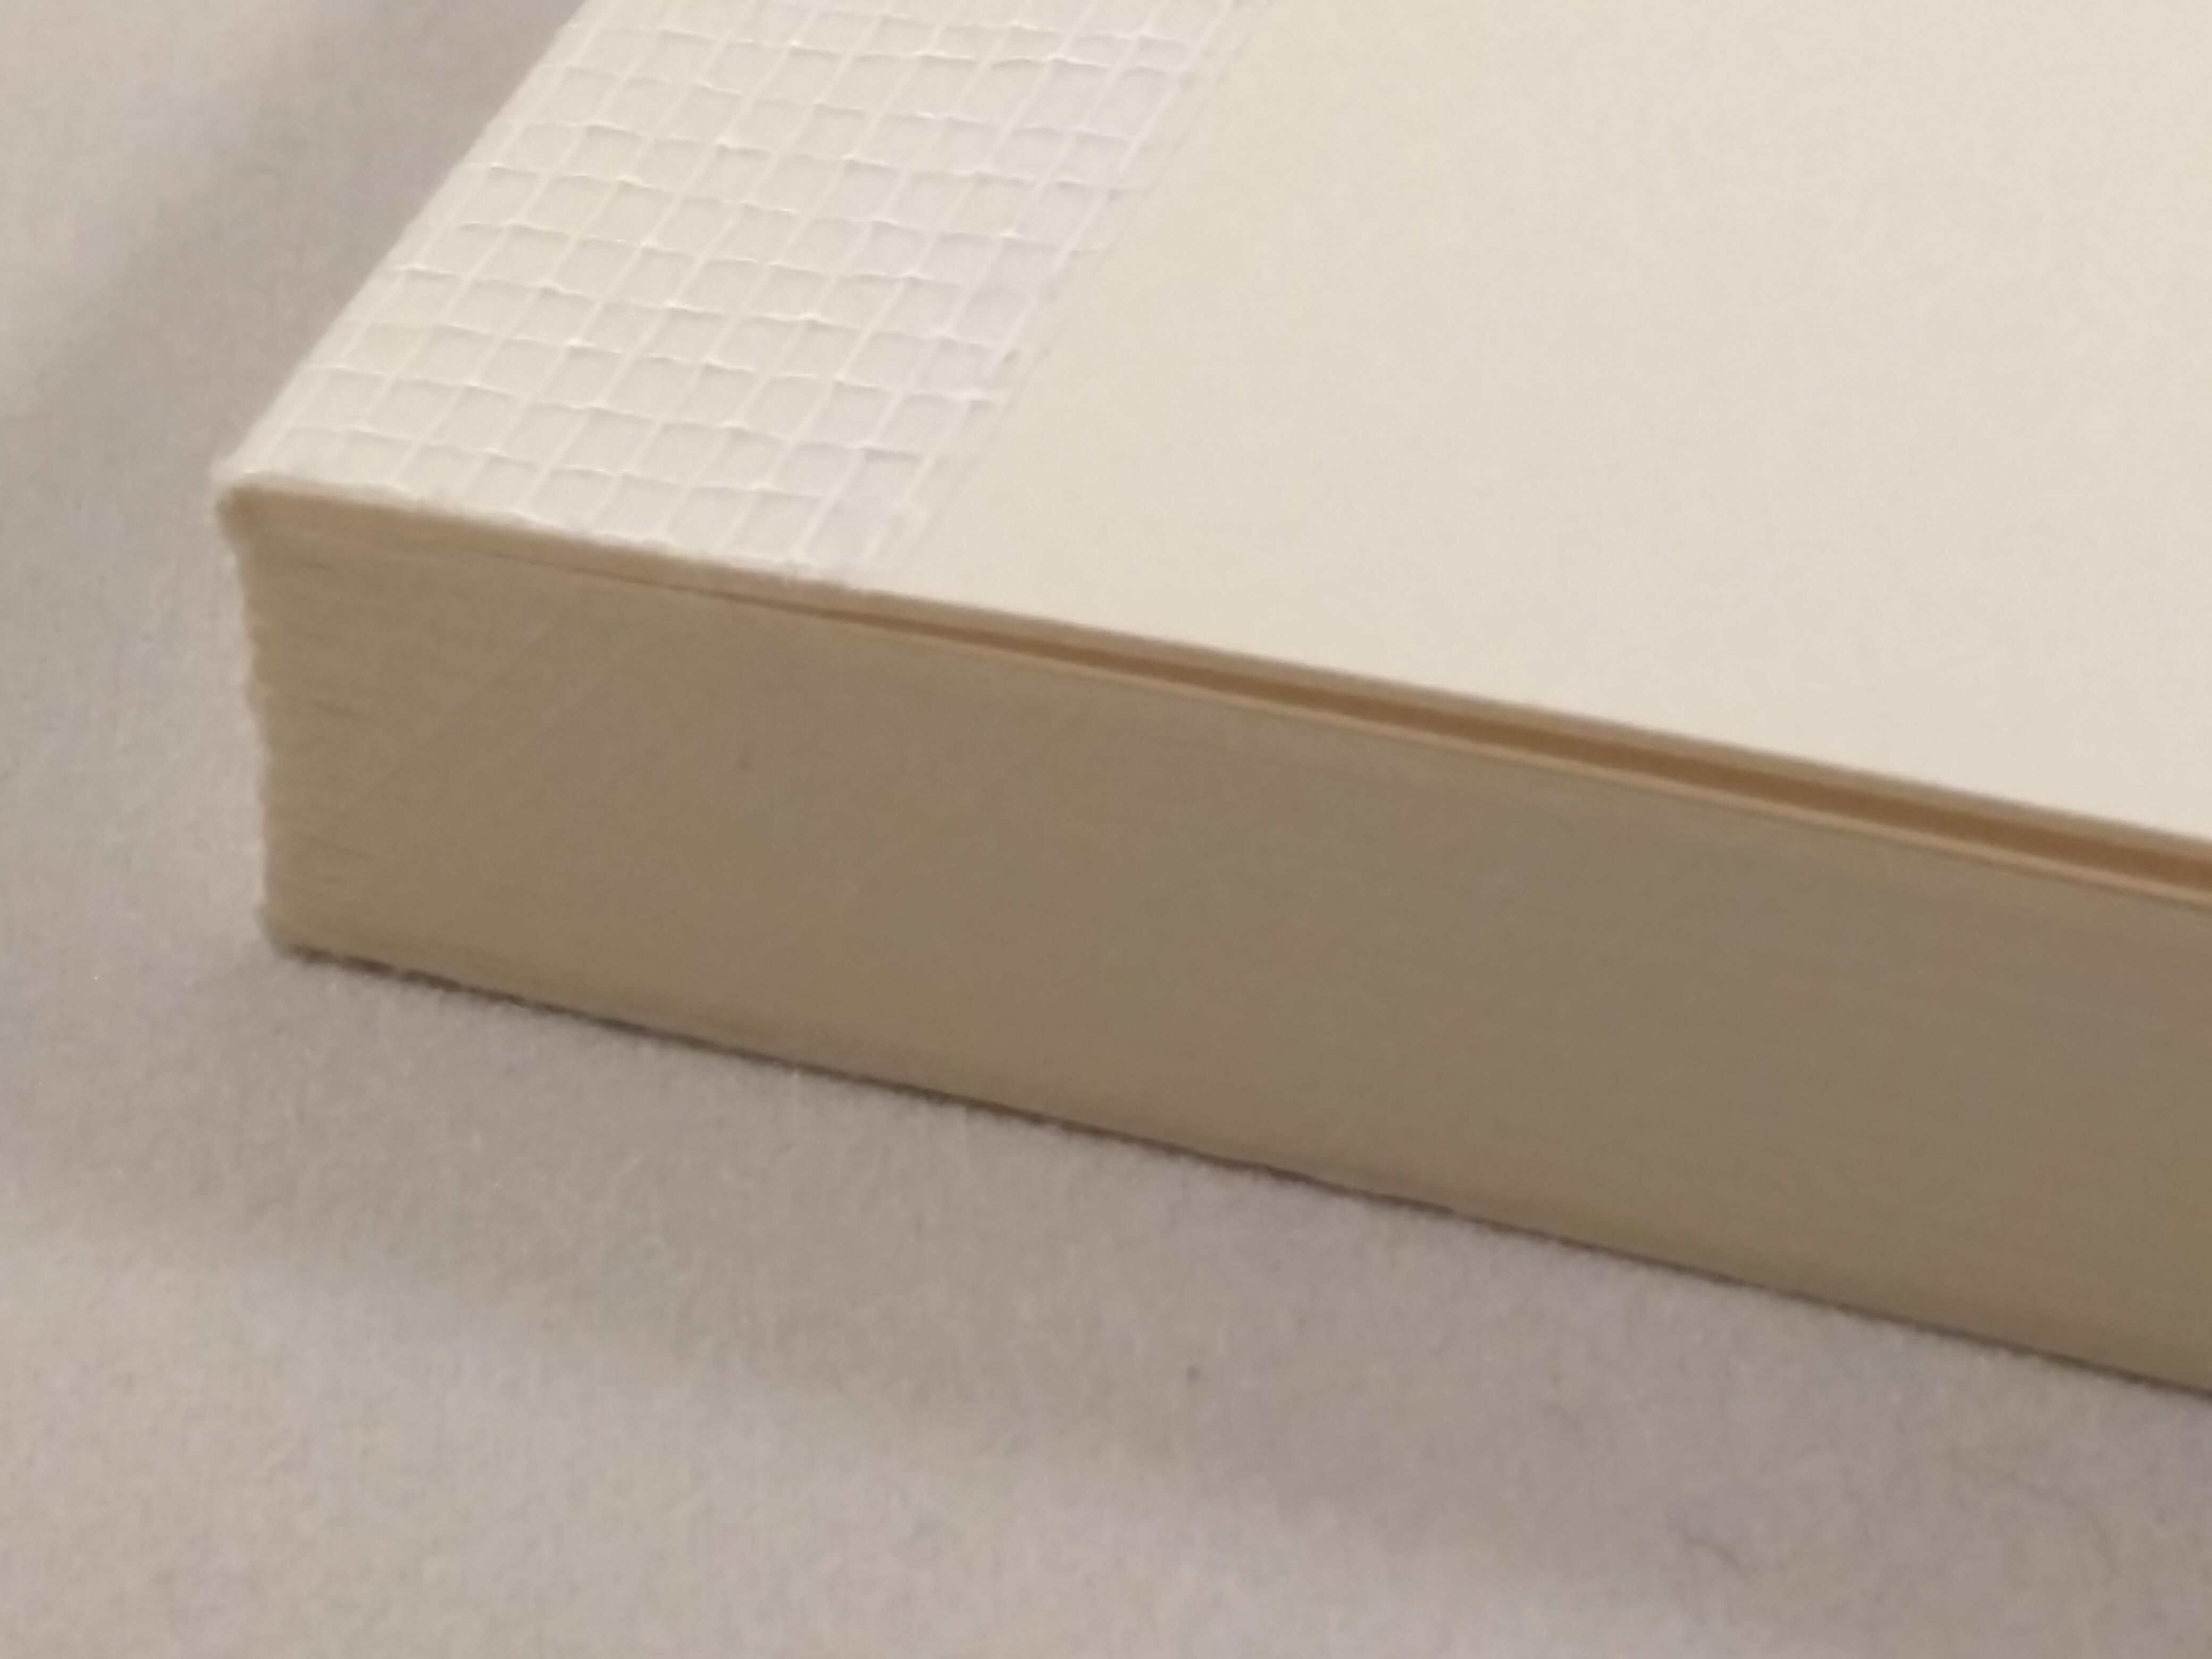 Midori MD notebook binding (#2)